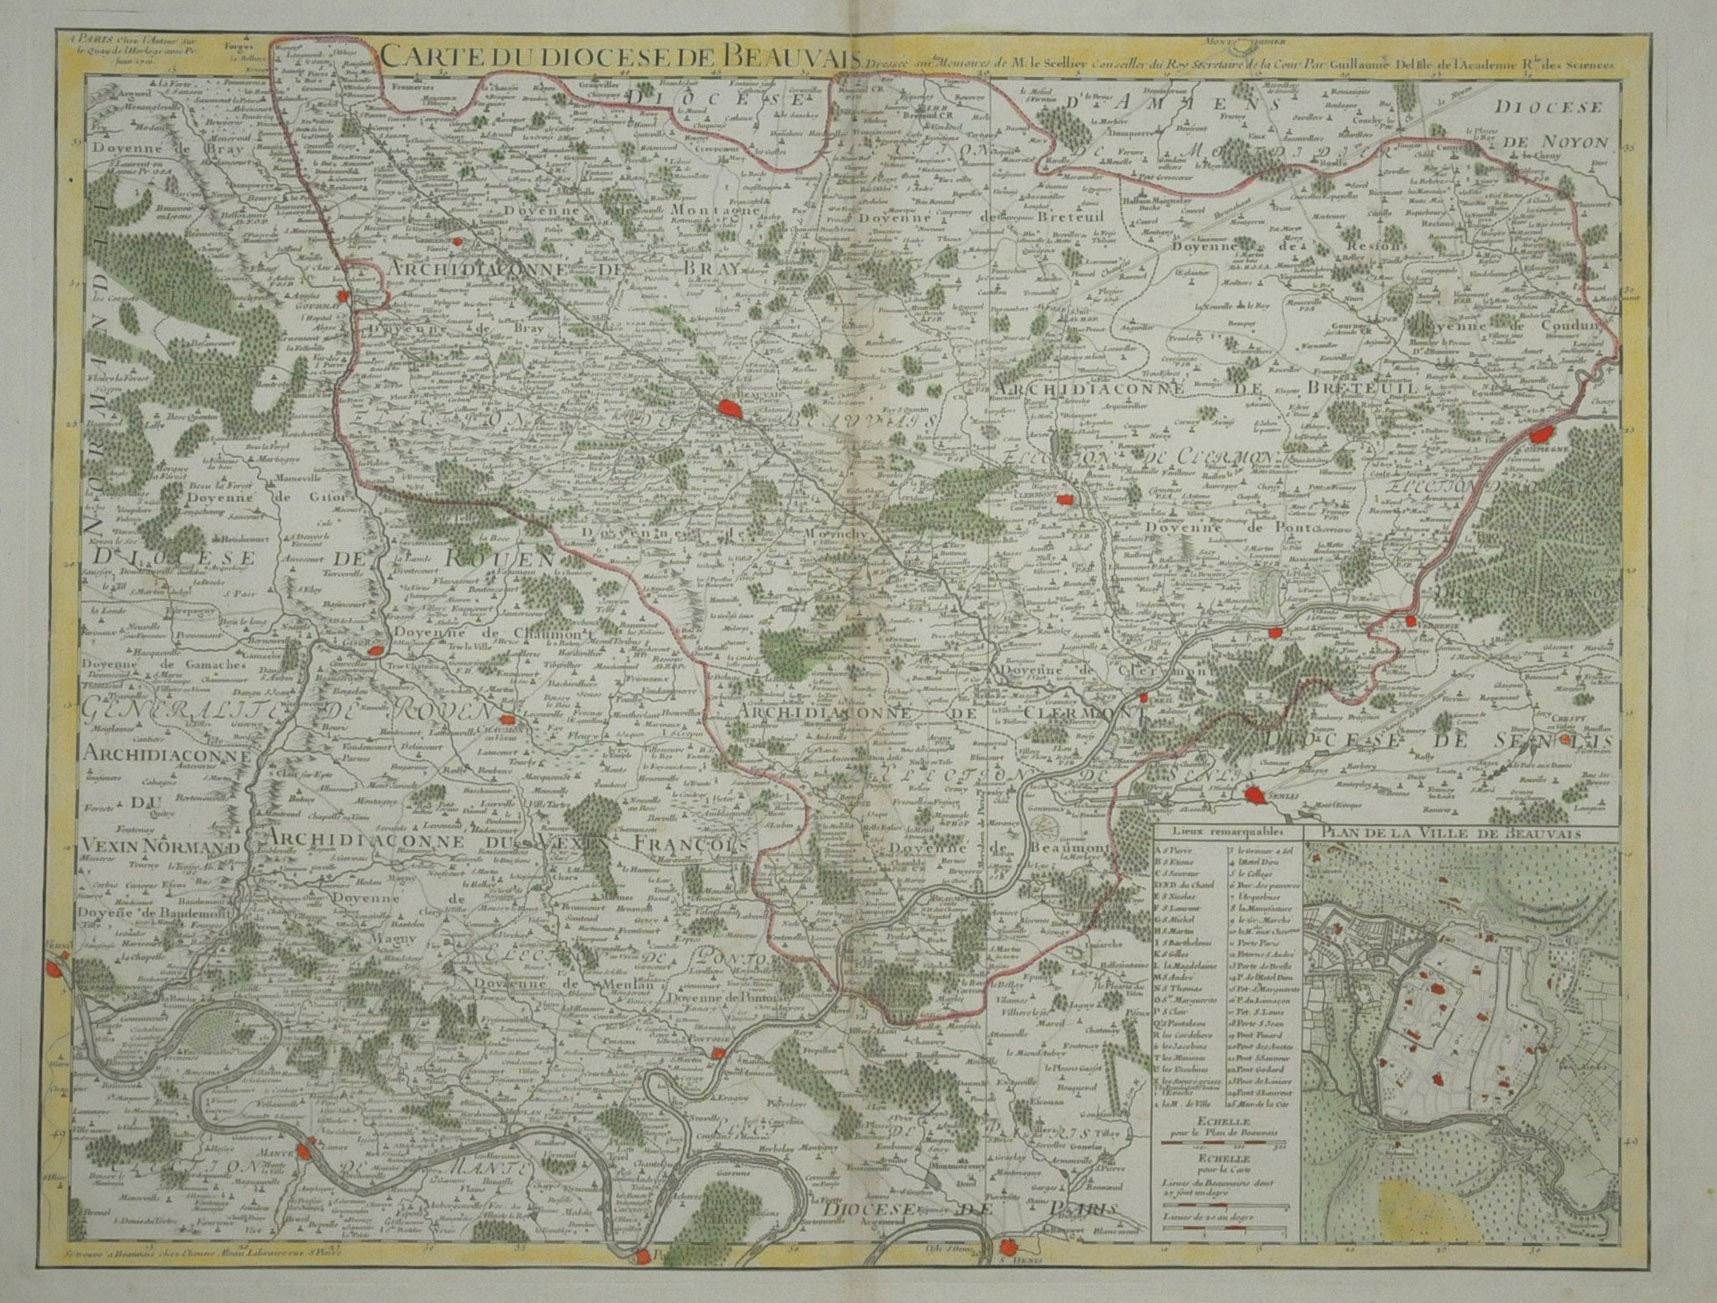 Carte du diocèse de beauvais cartes livres anciens